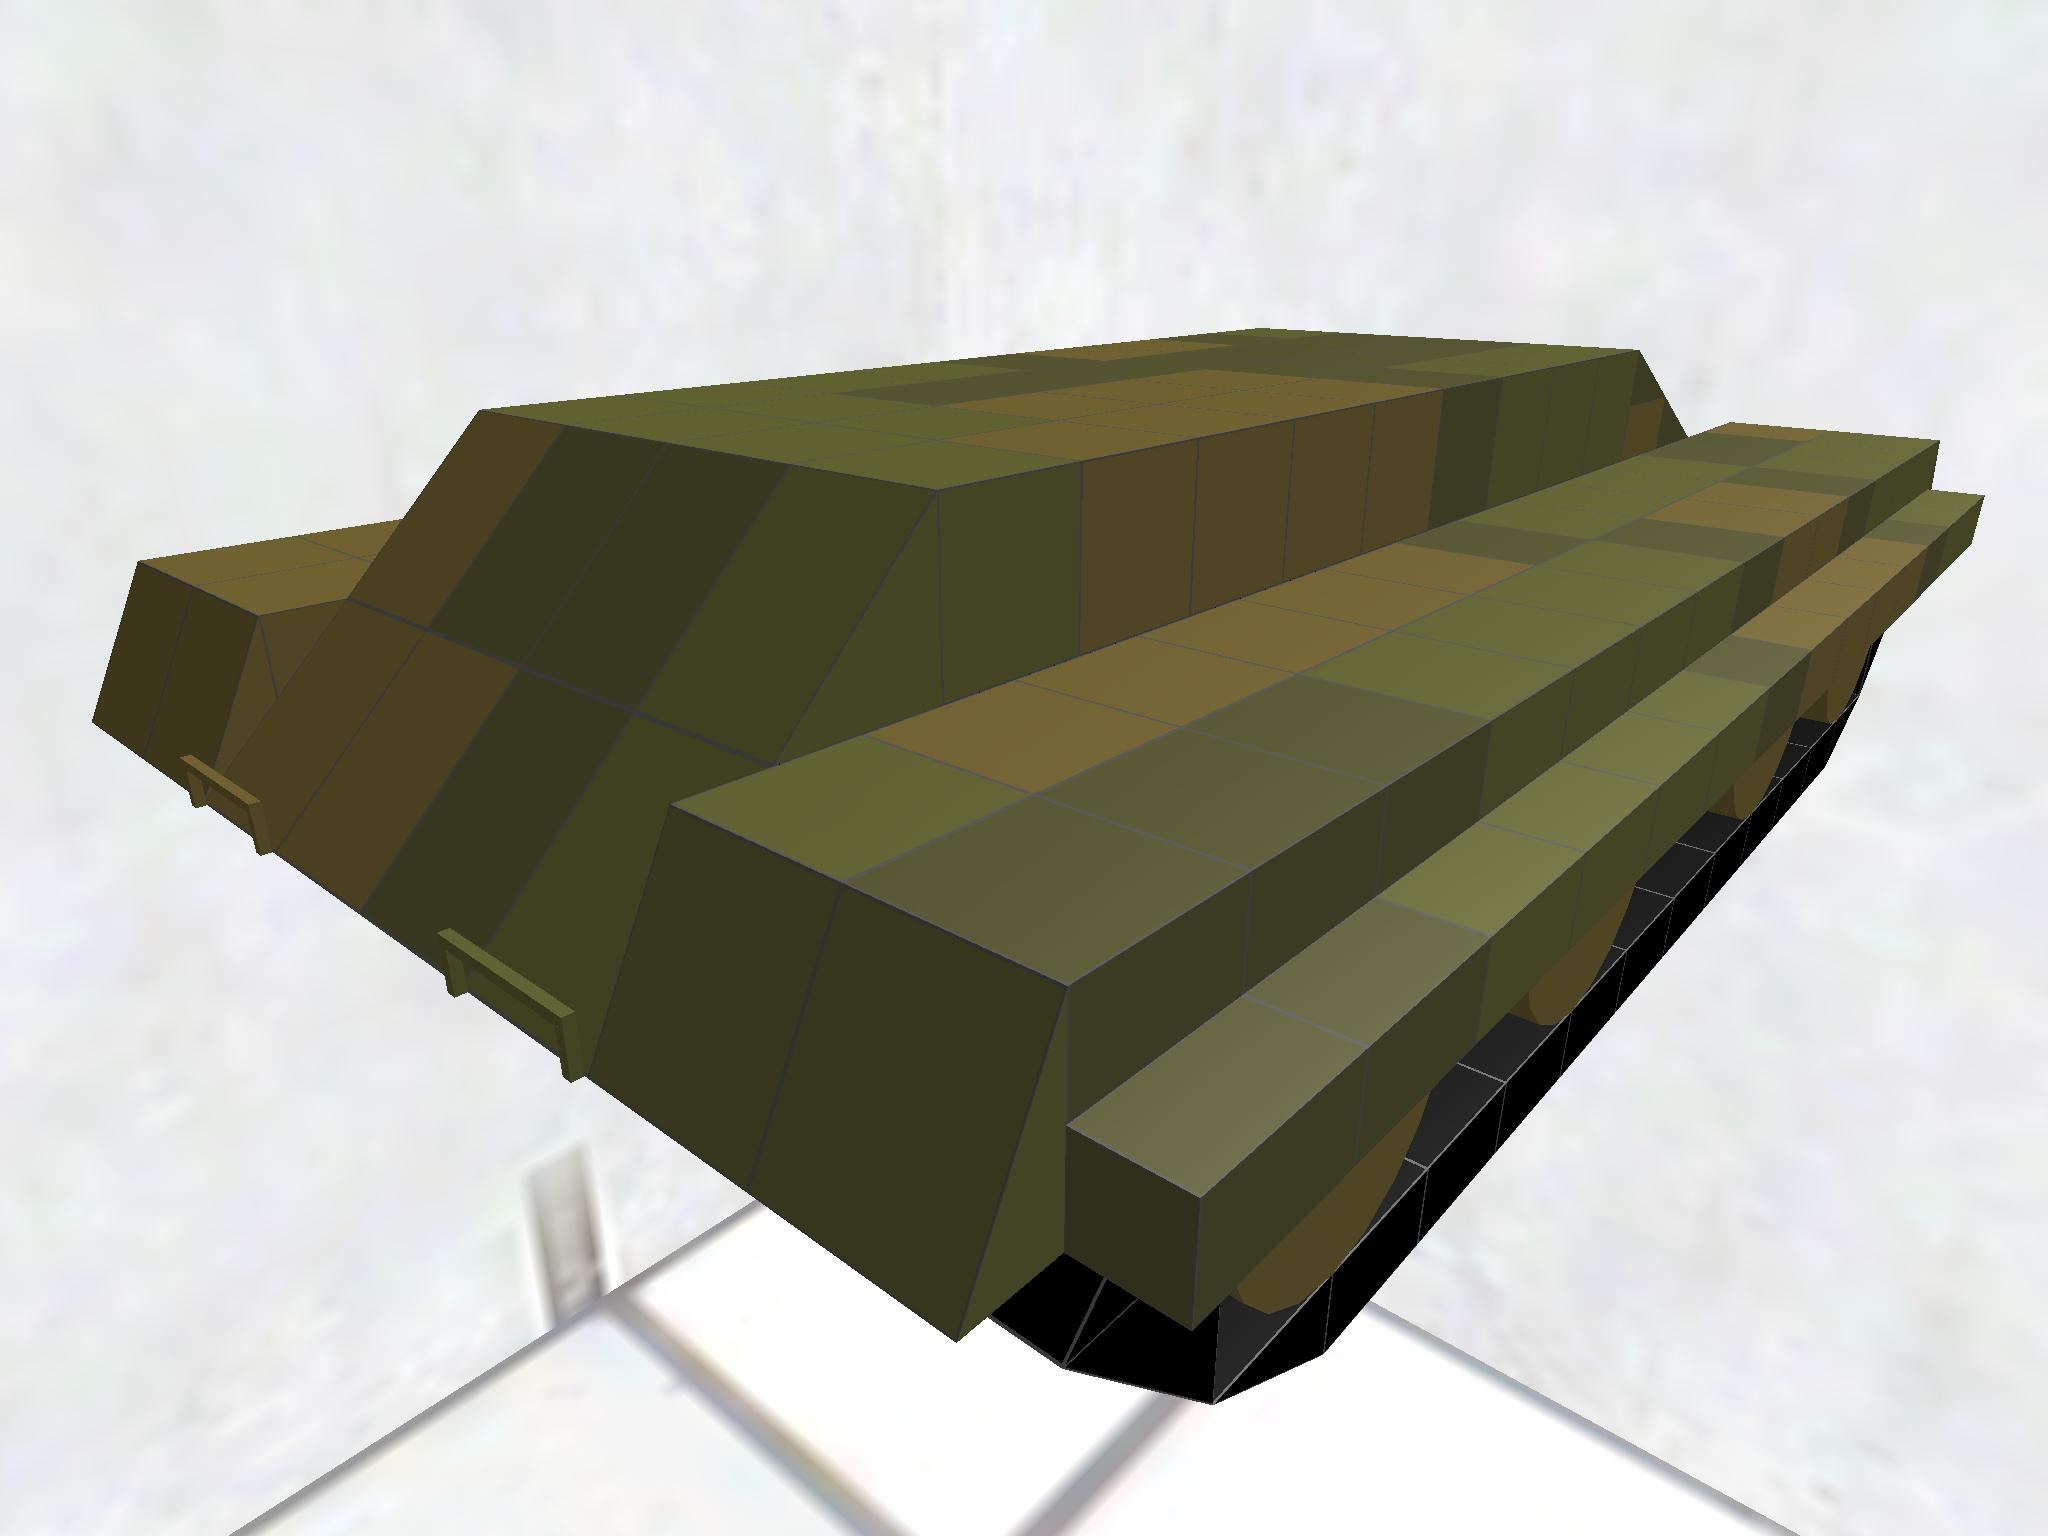 M50オントス自走無反動砲モドキの車体